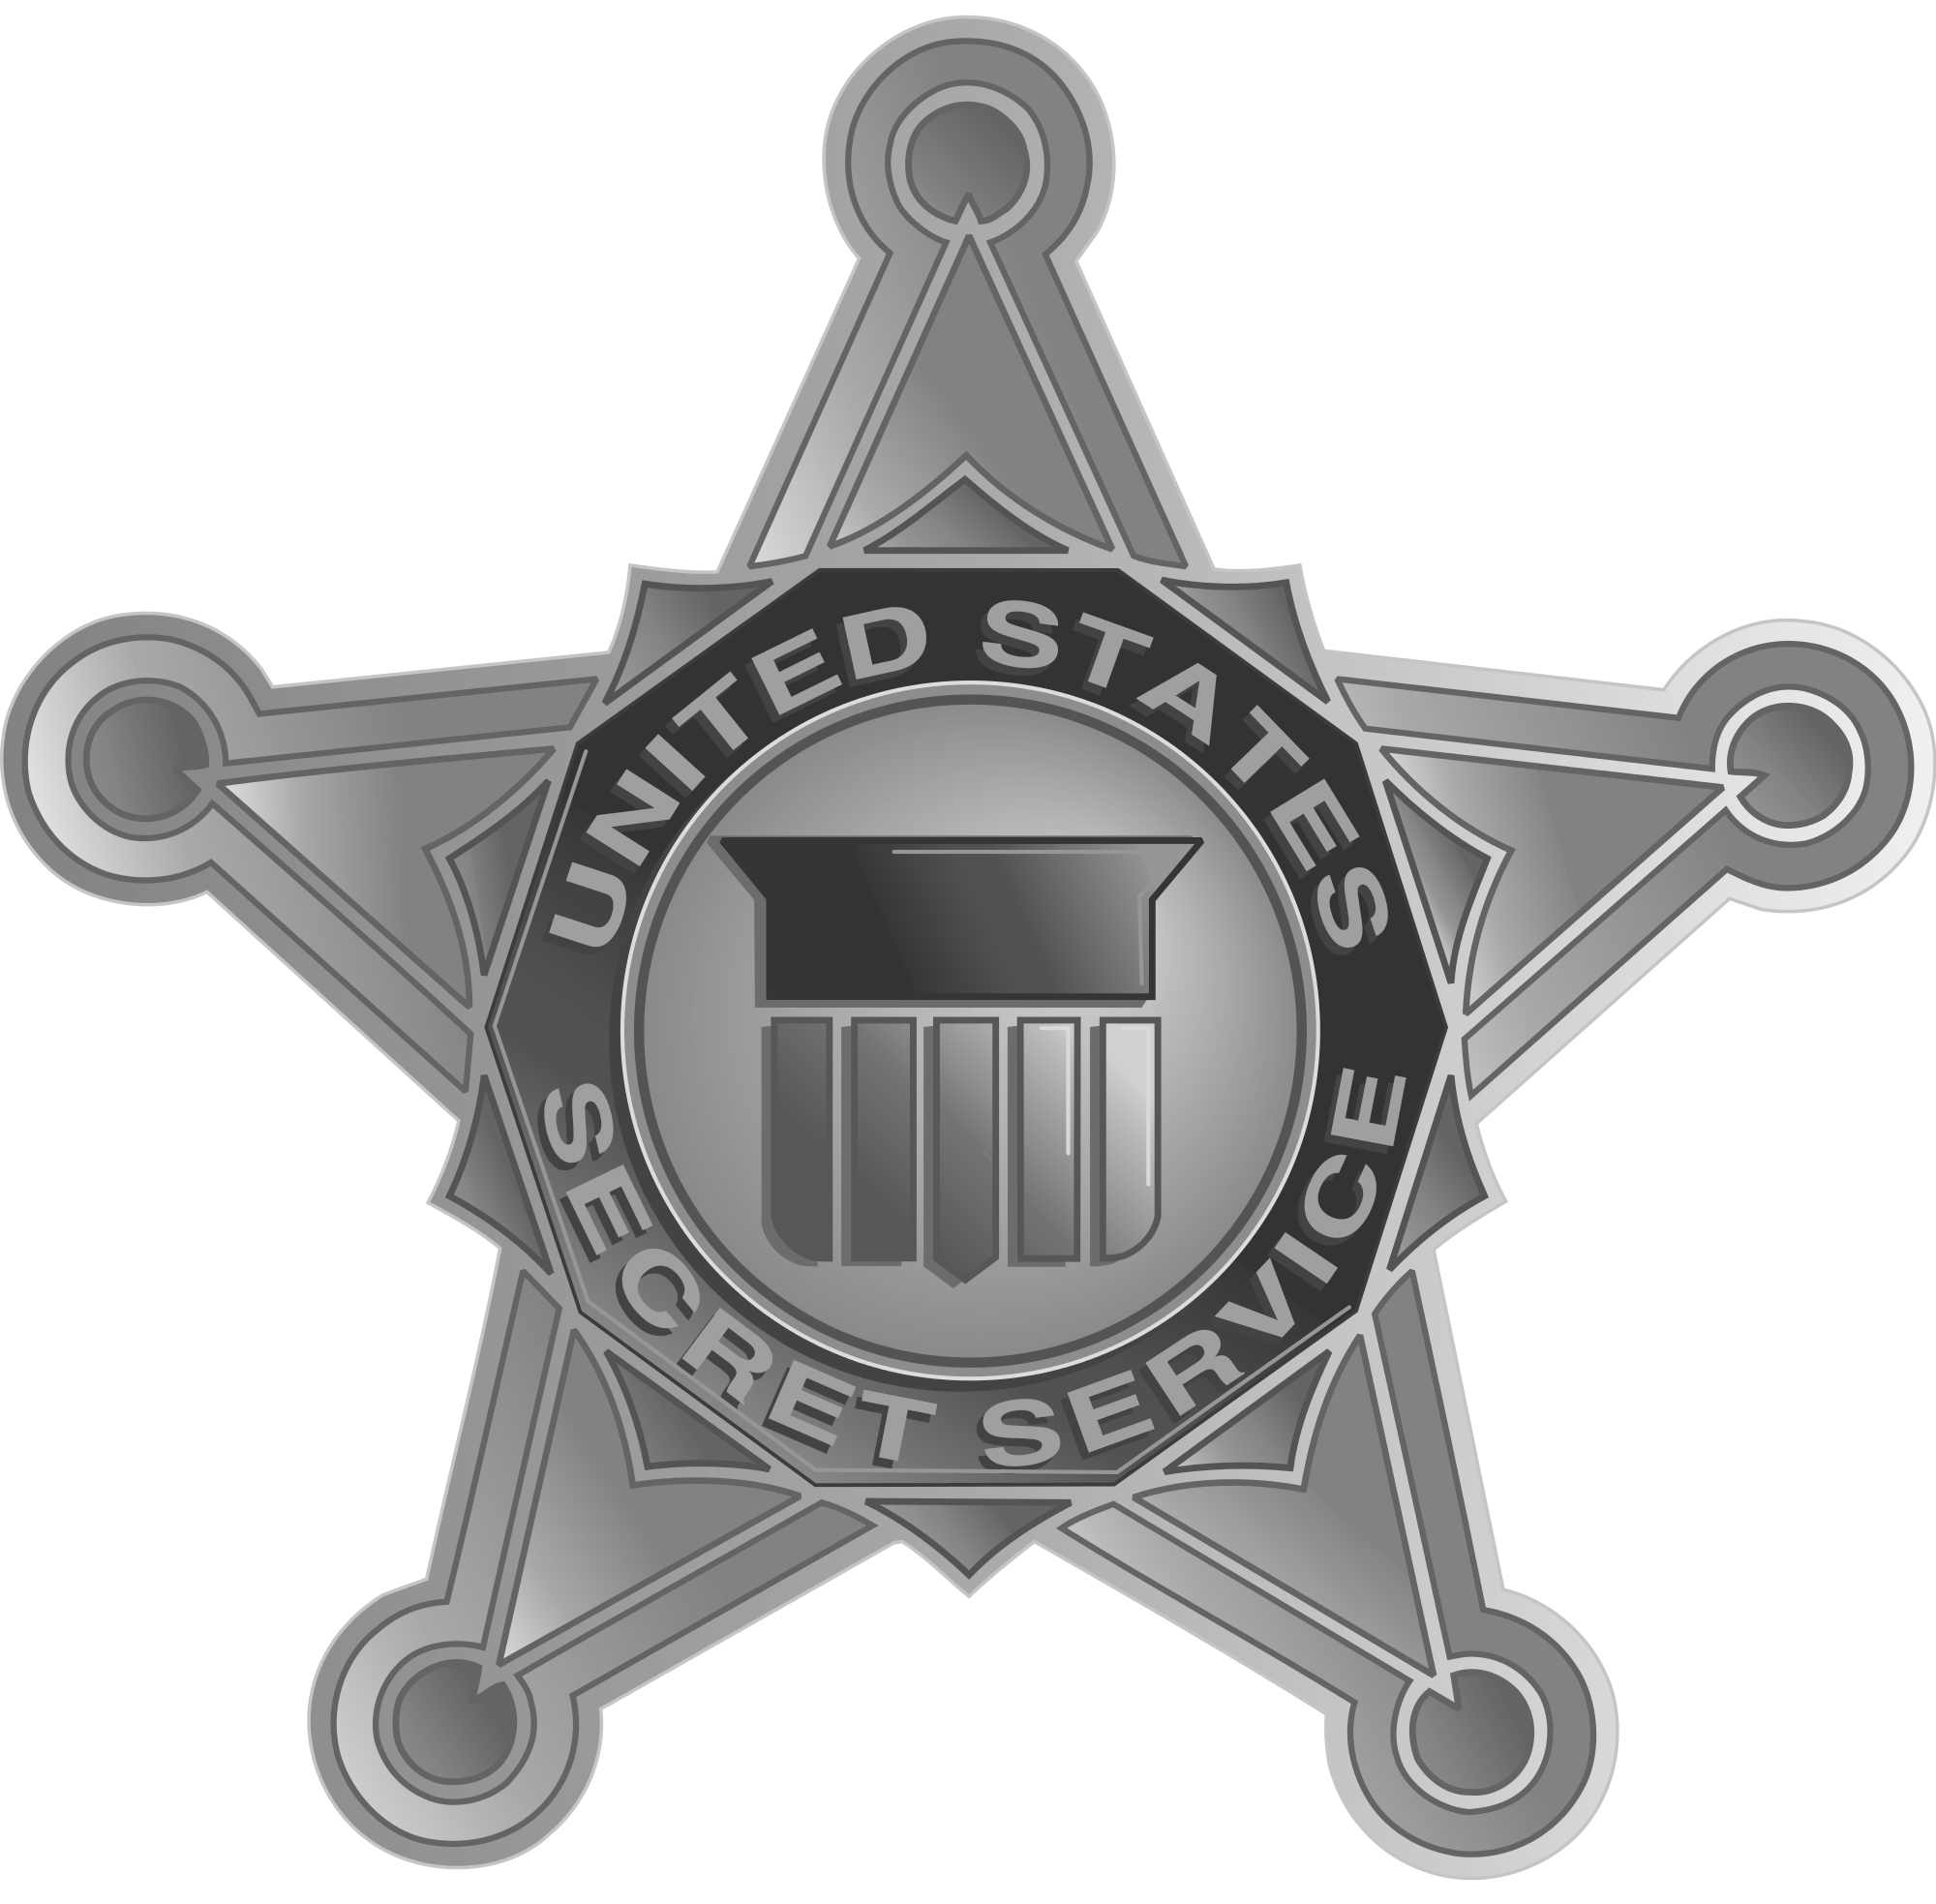 United States Secret